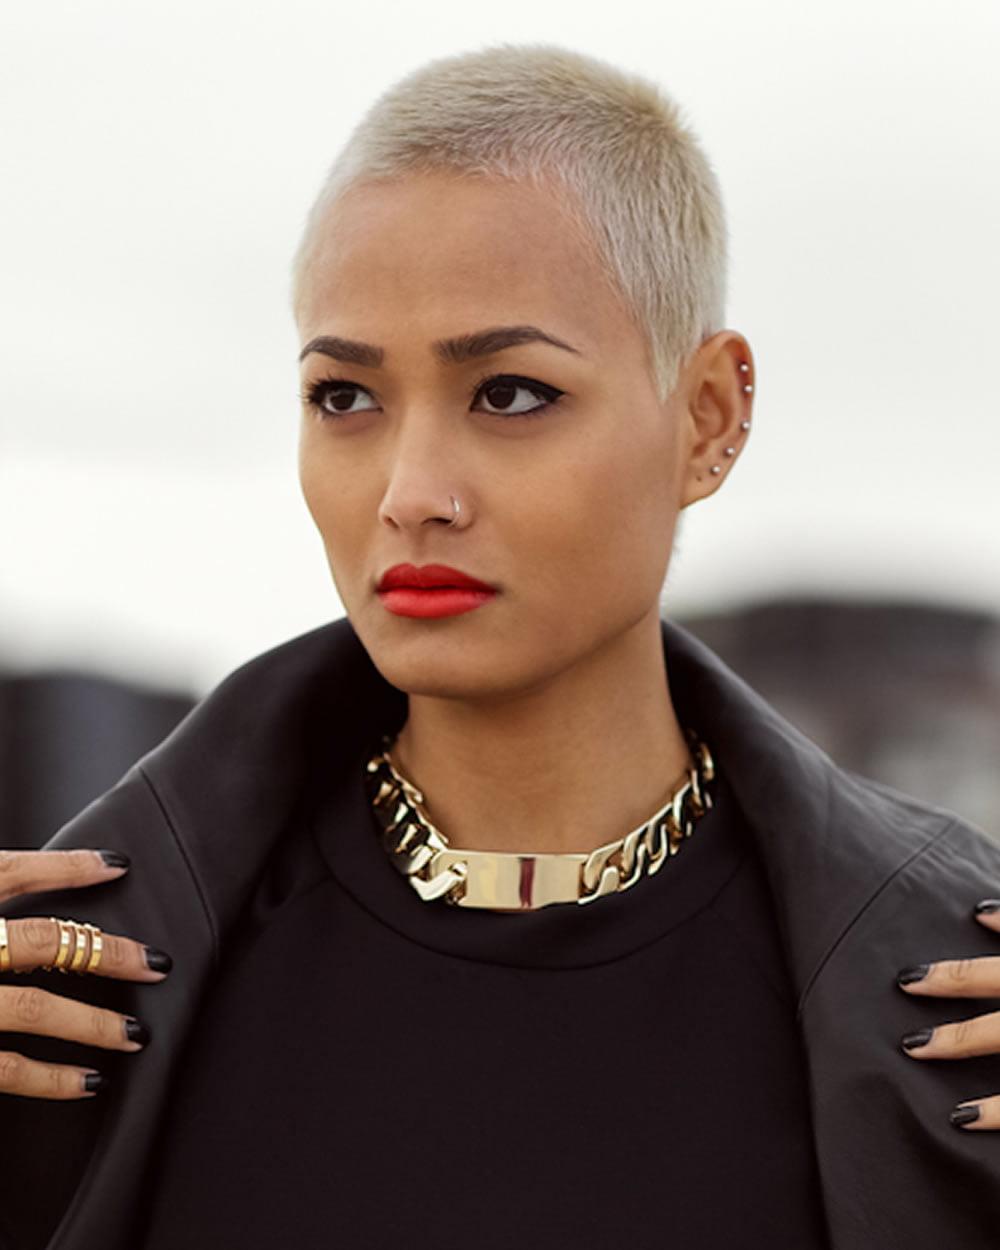 63 Best Short Haircuts of Famous Women - Cool Short ...